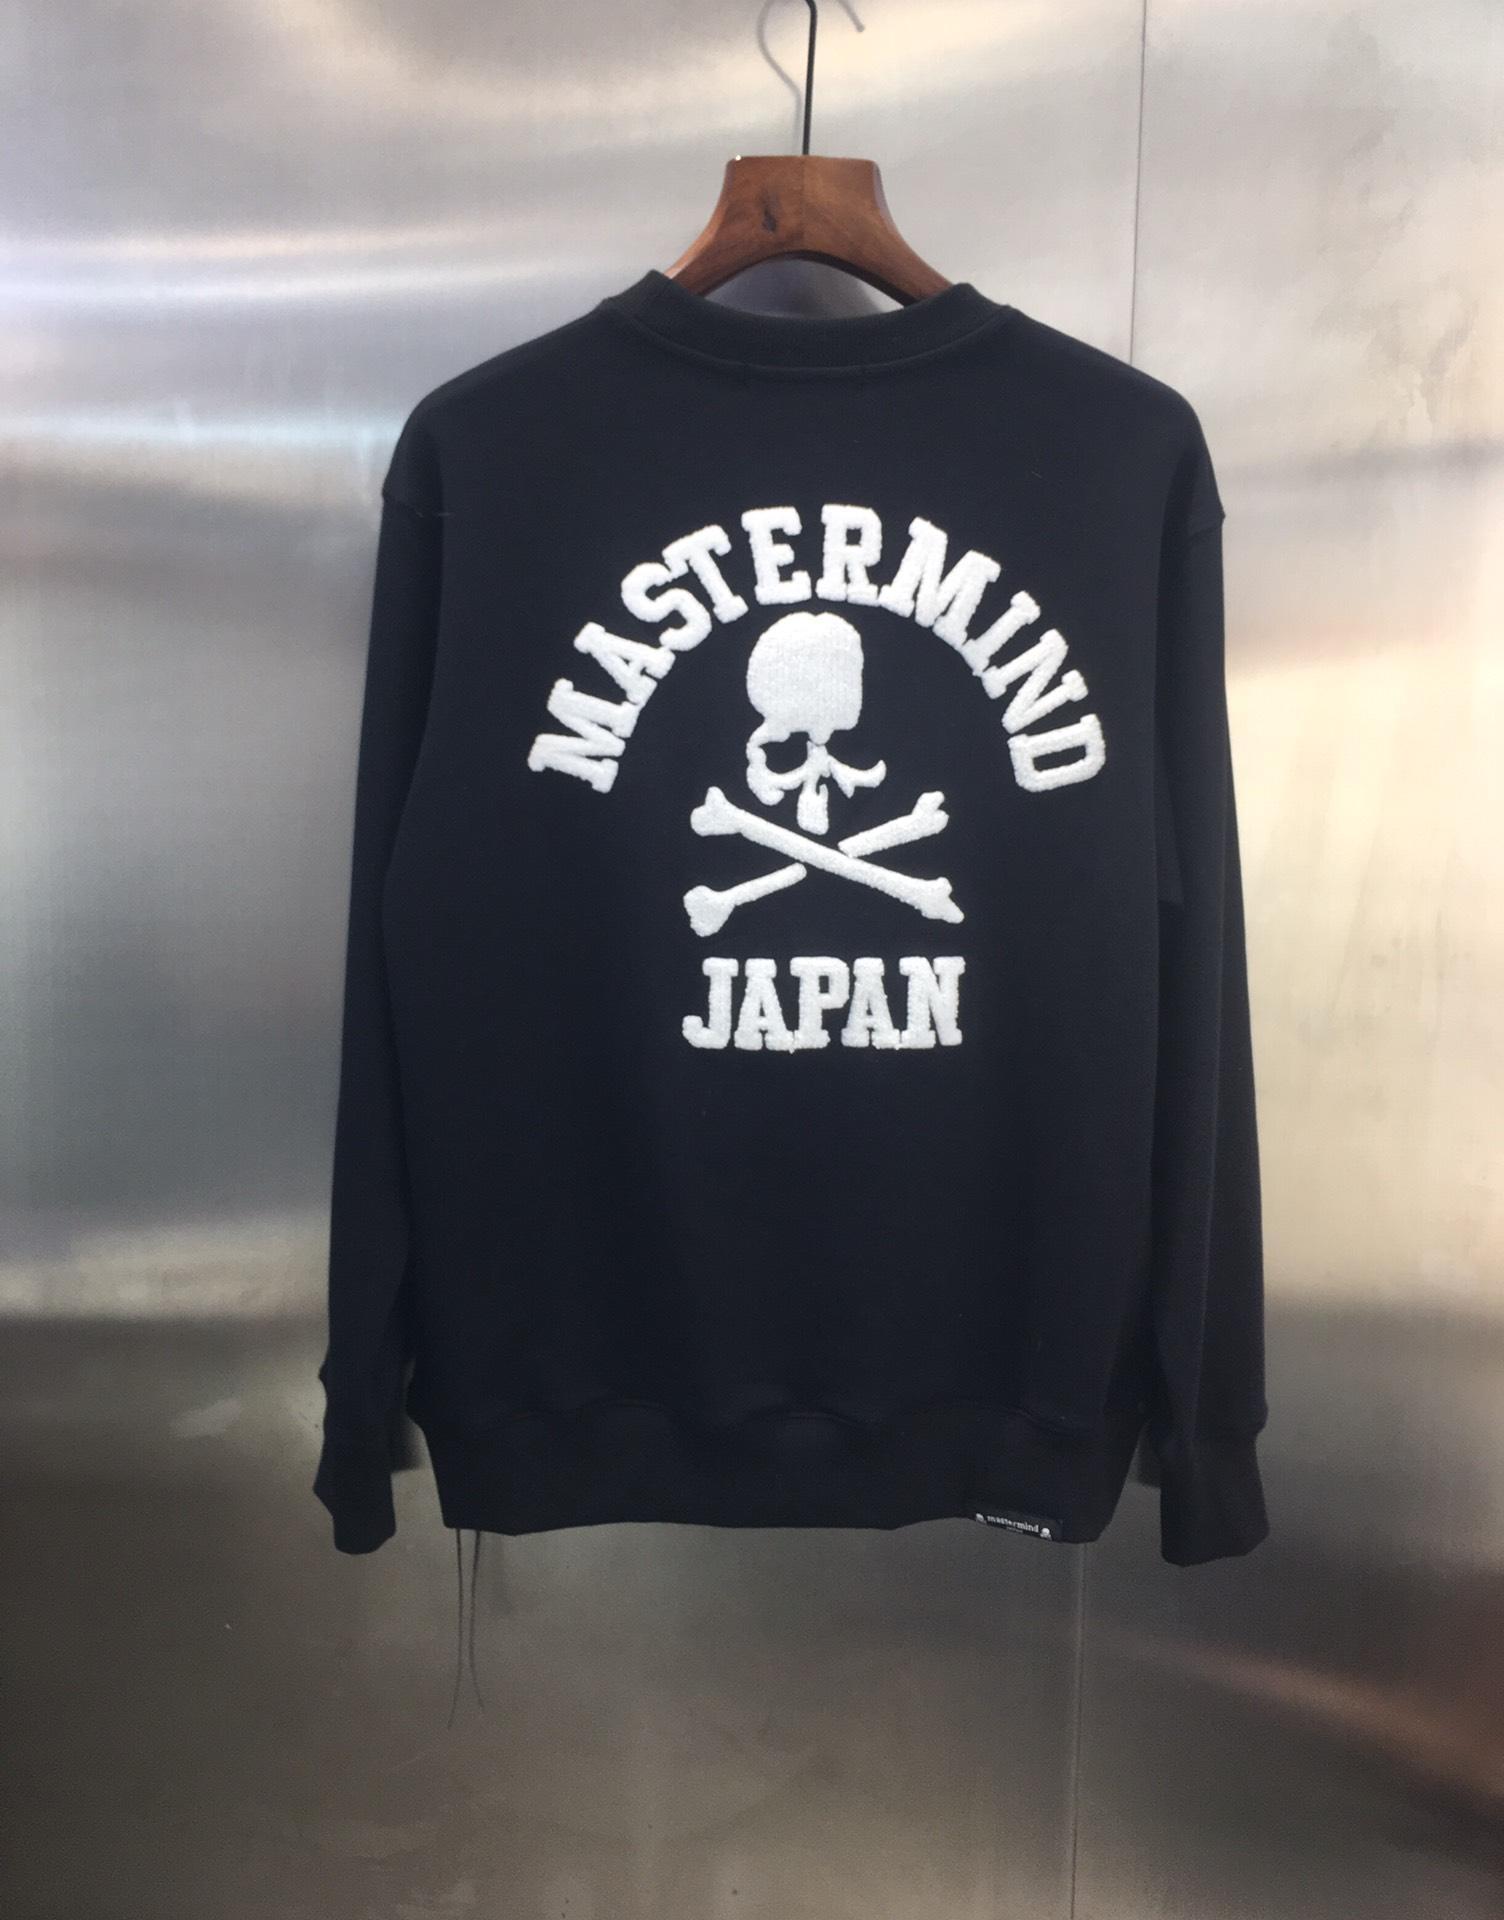 Japan Mastermind MMJ Hoodies Men Women Streetwear Hop Harajuku Xxxtentacion Sweatshirts Skateboard Hoodie